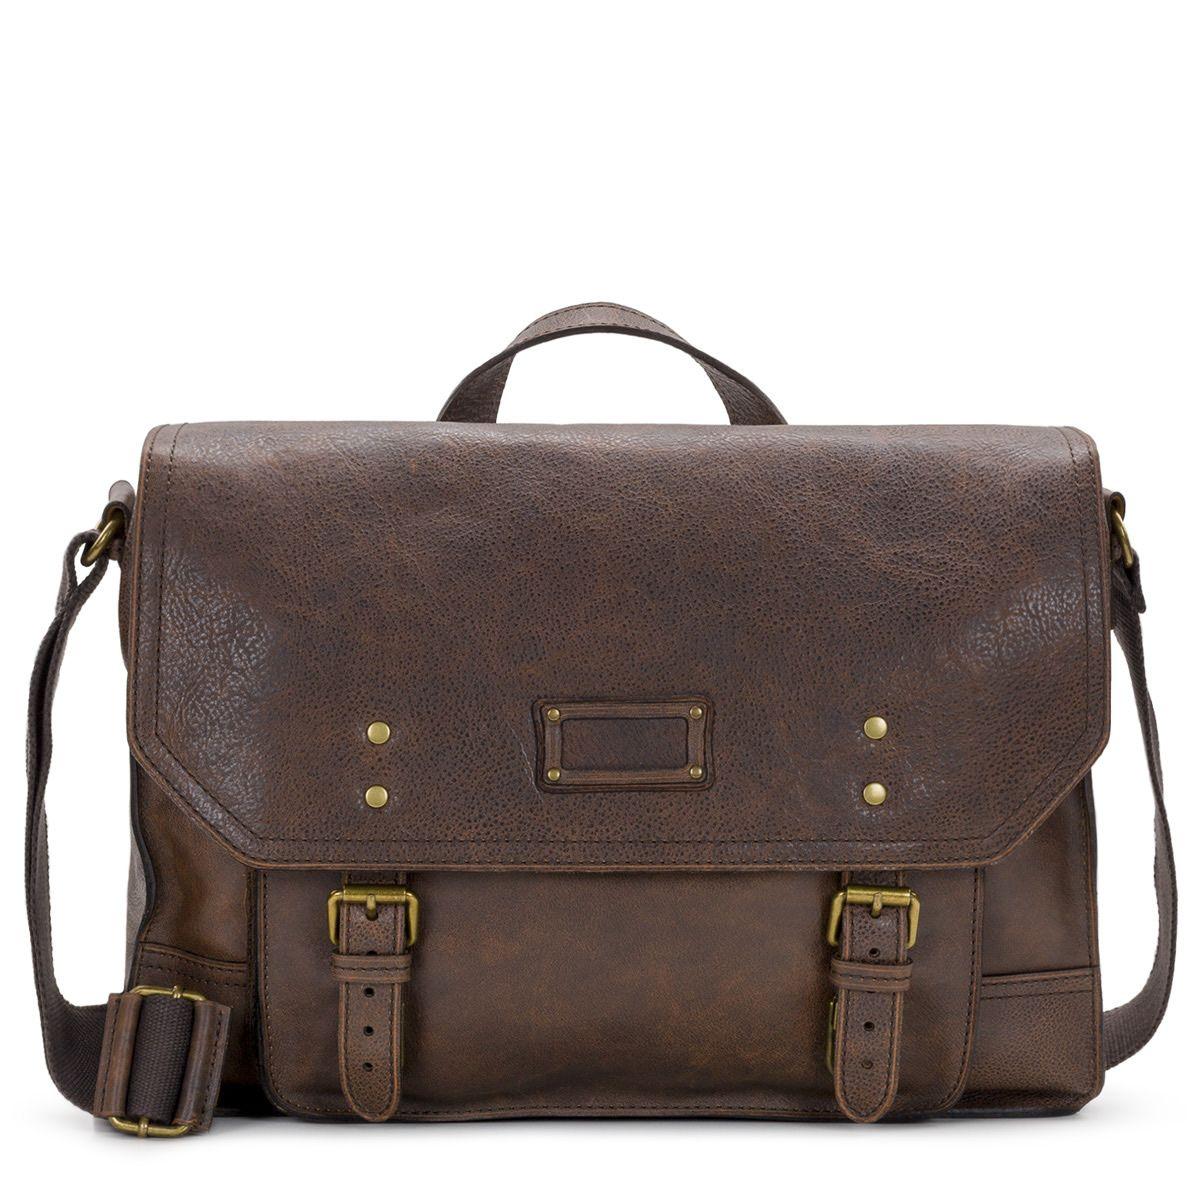 a625f1b7a943 Patricia Nash Handbags - Macy s